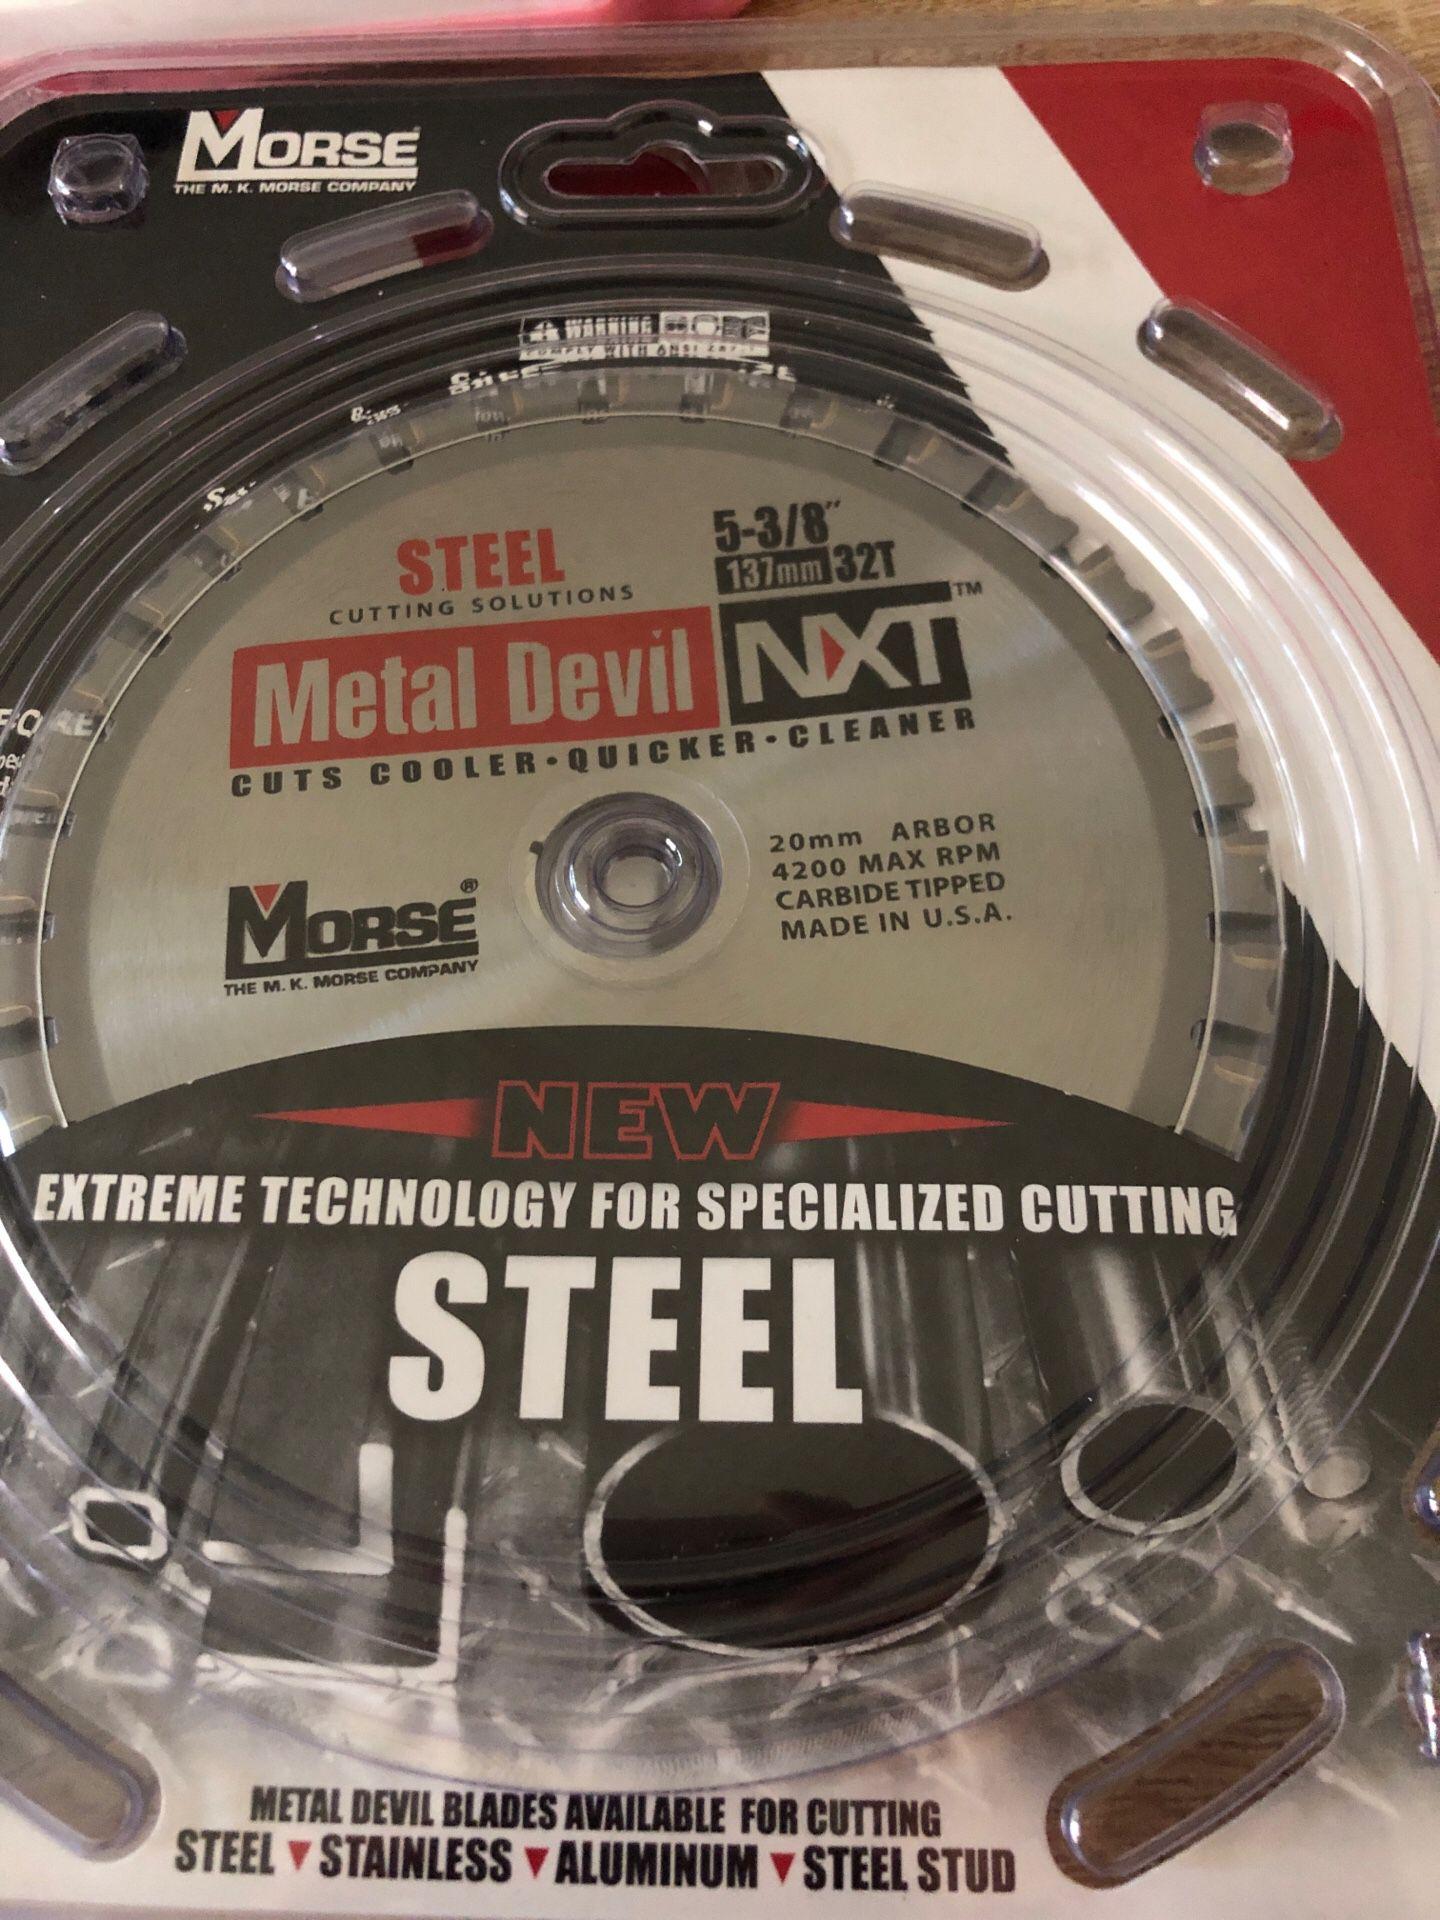 Morse Steel Cutting Blade